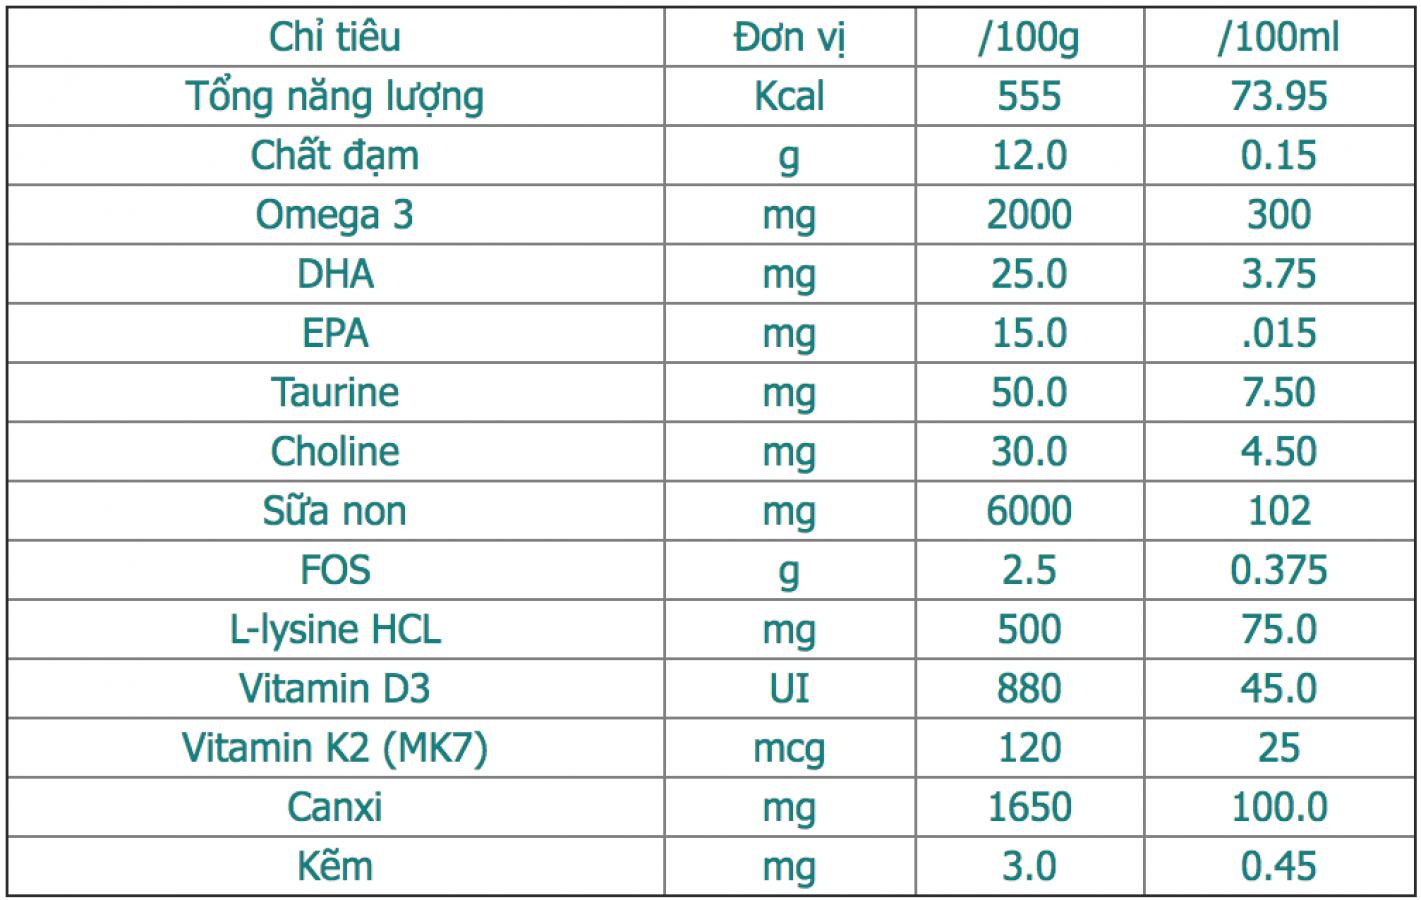 Sữa Non Richmond Boncare Colostrum Tăng Lợi Khuẩn Cho Bé